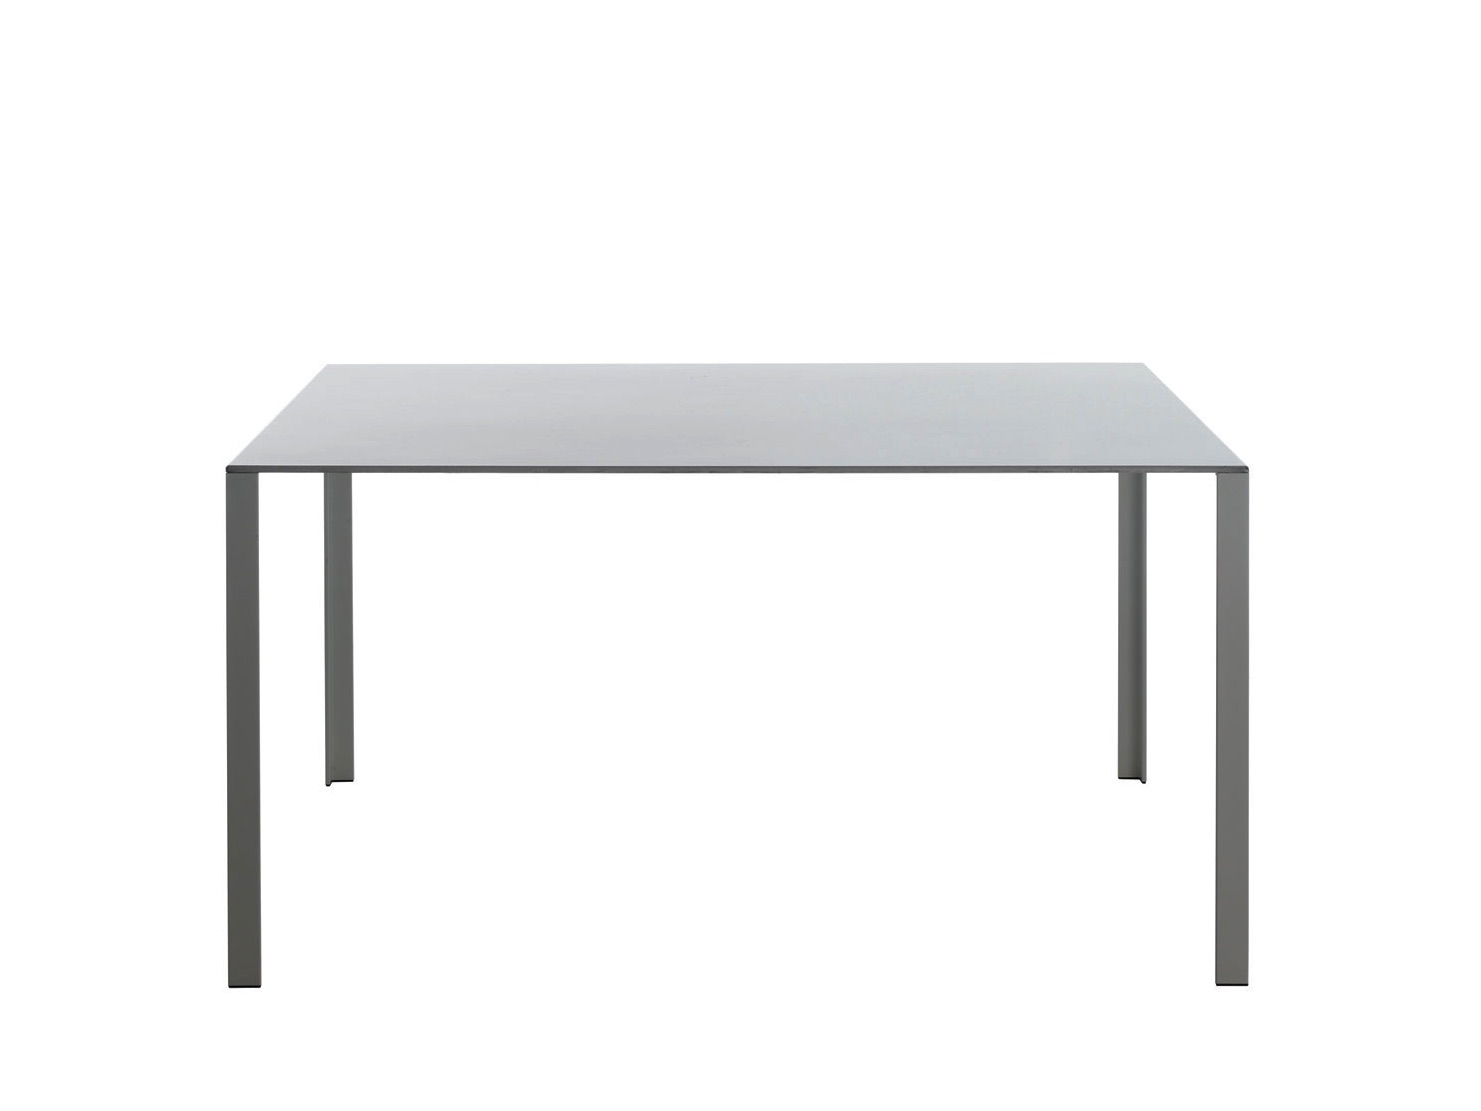 Table molteni table lessless 140x140 - Tavolo less molteni misure ...